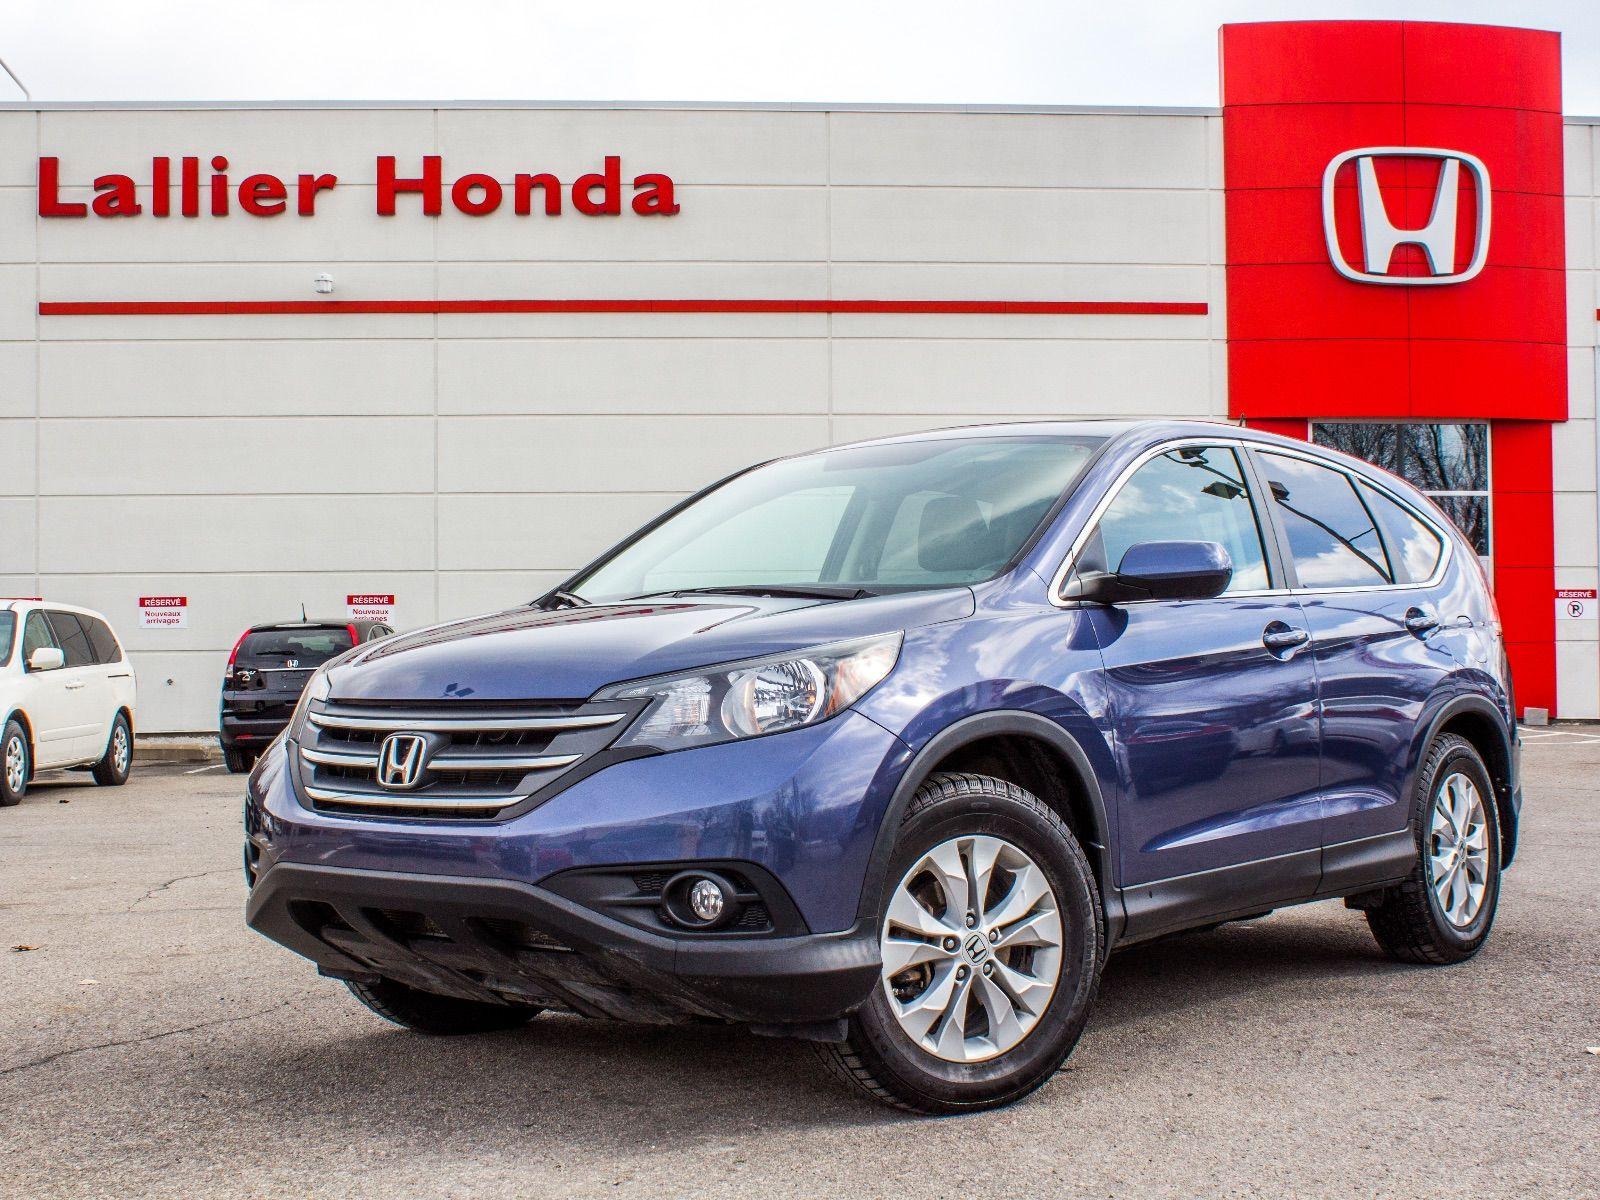 Pre owned 2012 honda cr v ex l lallier honda montreal in for Honda used inventory